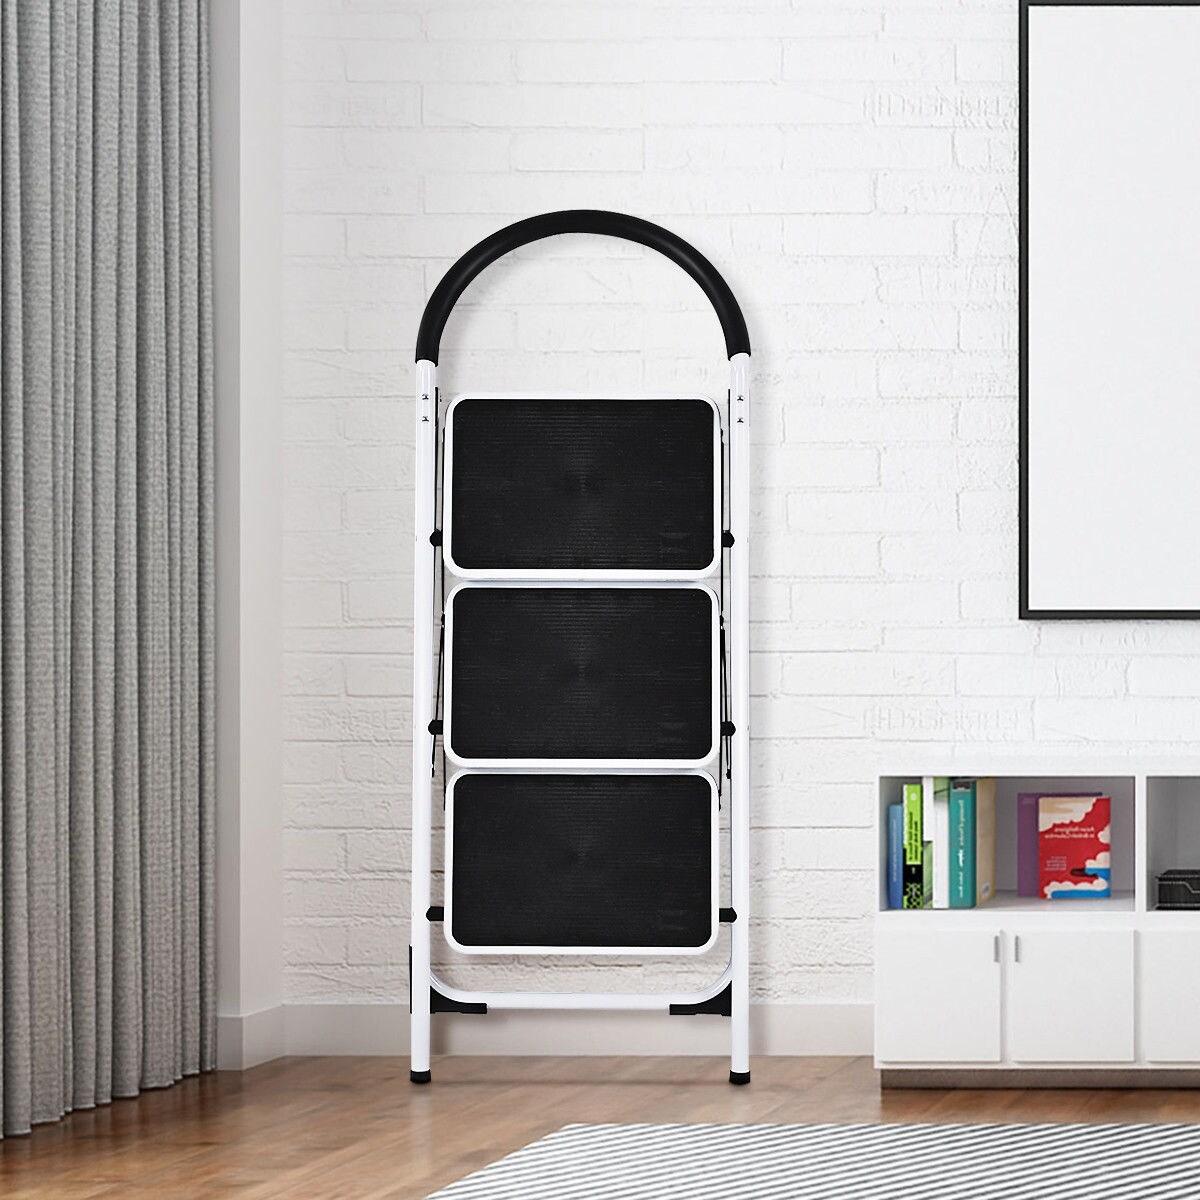 Costway 3 Step Ladder Folding Stool Heavy Duty 330lbs Capacity Industrial Lightweight Black White